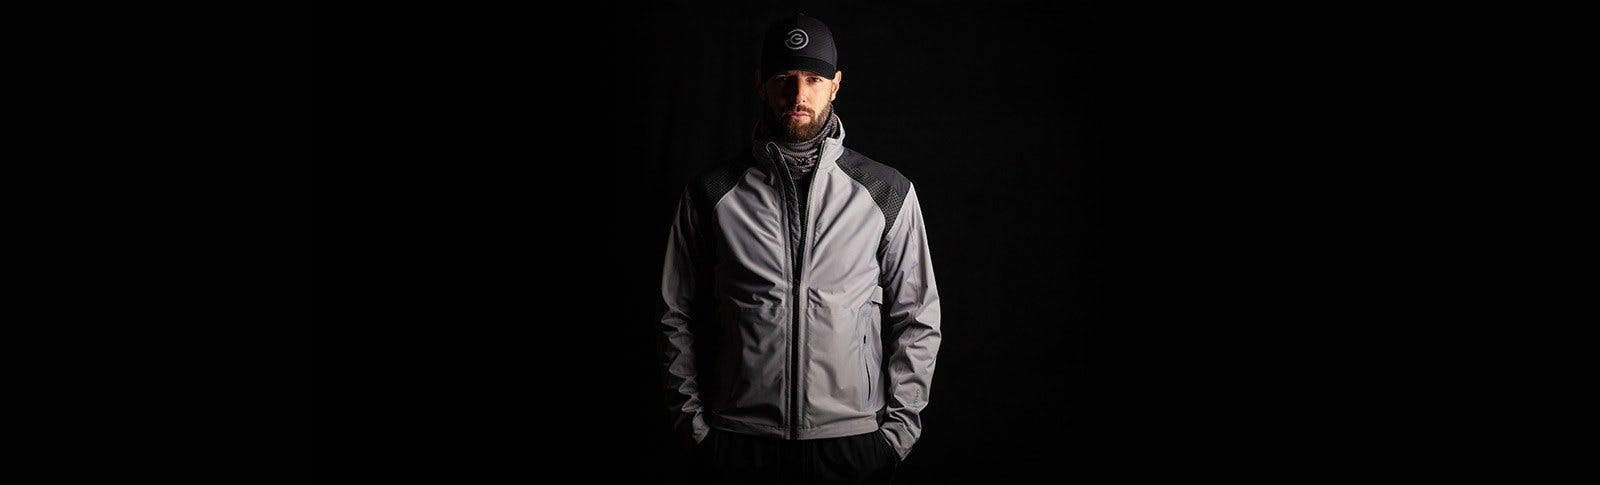 Galvin Green Action Waterproof C Knit Golf Jacket